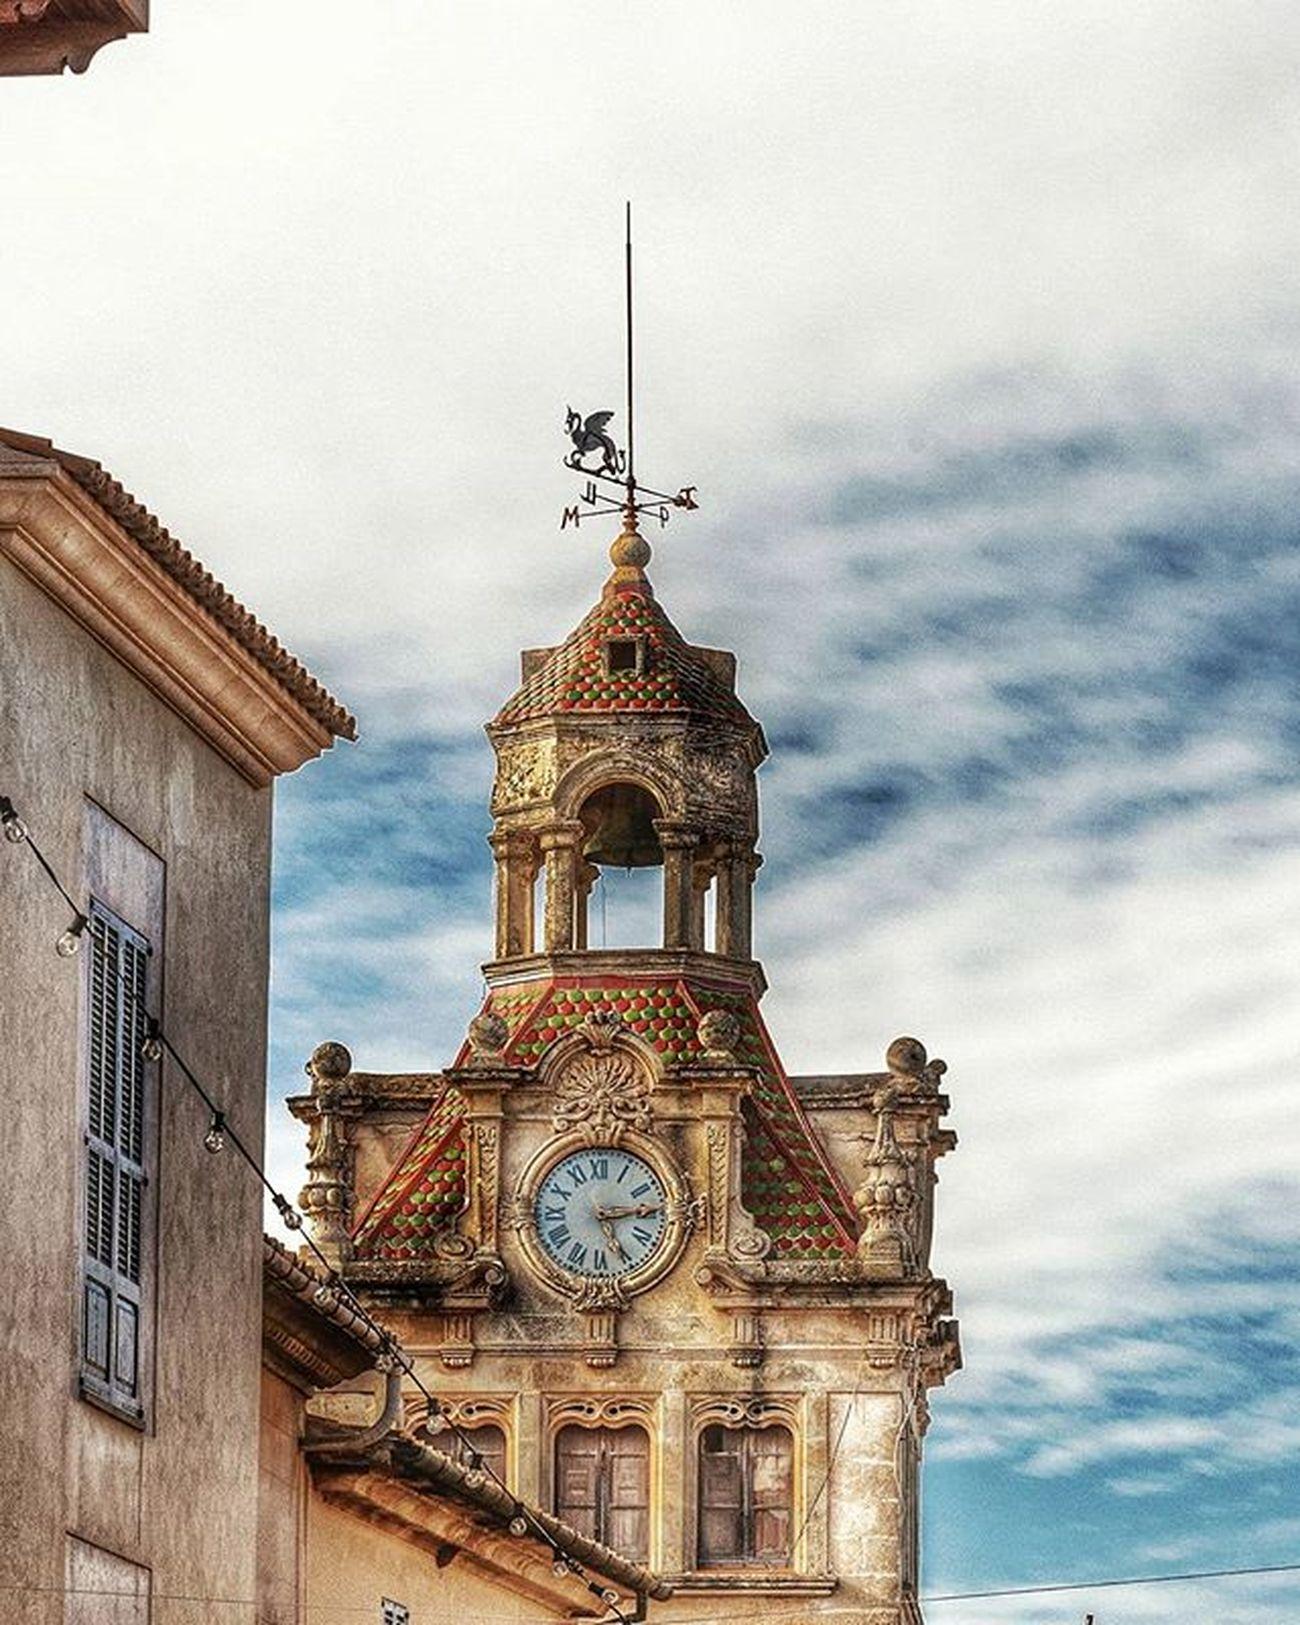 Ajuntament D'alcudia Alcudia Mallorca Illesbalears Loves_mallorca Igers Instagram Streetfoto Loves_balears Loves_spain Loves_world Loves_europa Fotografia Mallorcaframes Estaes_espania Estaes_europa Balearespasoapaso Turismo Turismospain Turismobaleares Islasbaleares Estaes_mallorca